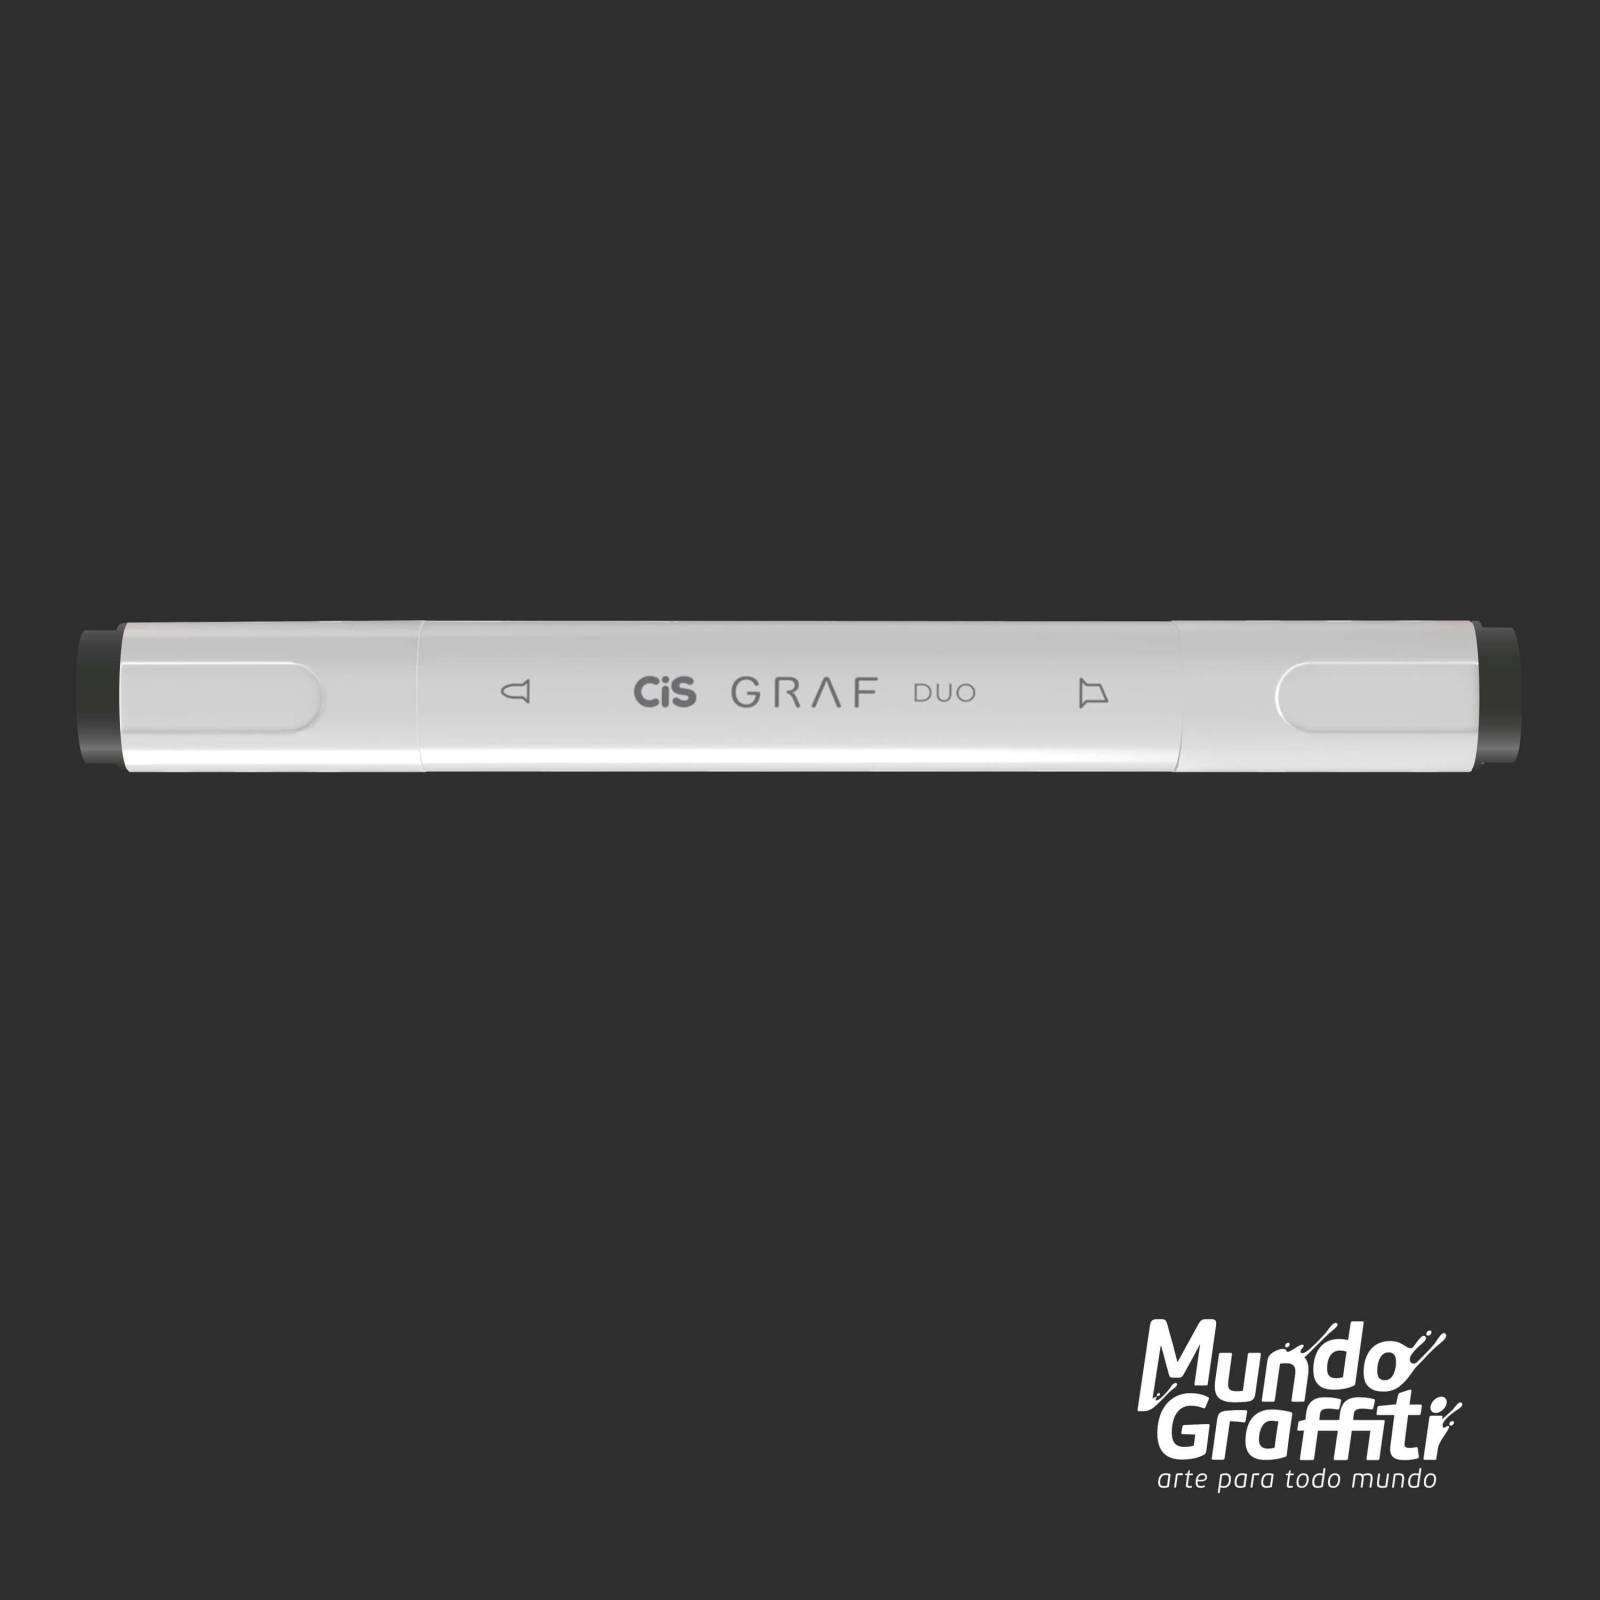 Marcador Cis Graf Duo Cool Grey CG9 - Mundo Graffiti